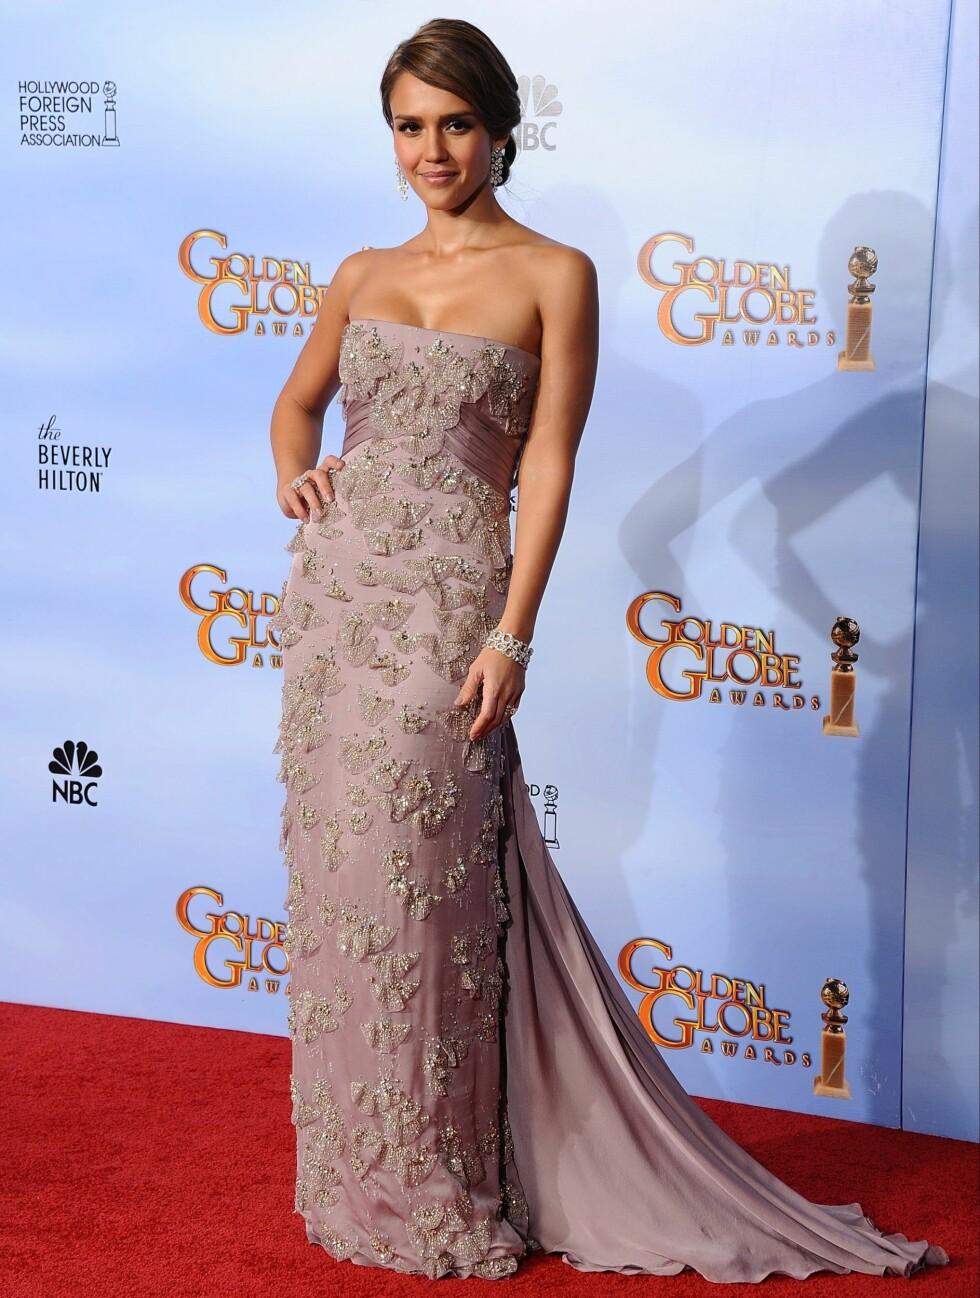 VALGTE GUCCI: Jessica Alba strålte i en stroppeløs kreasjon fra luksusmerket Gucci.  Foto: Stella Pictures